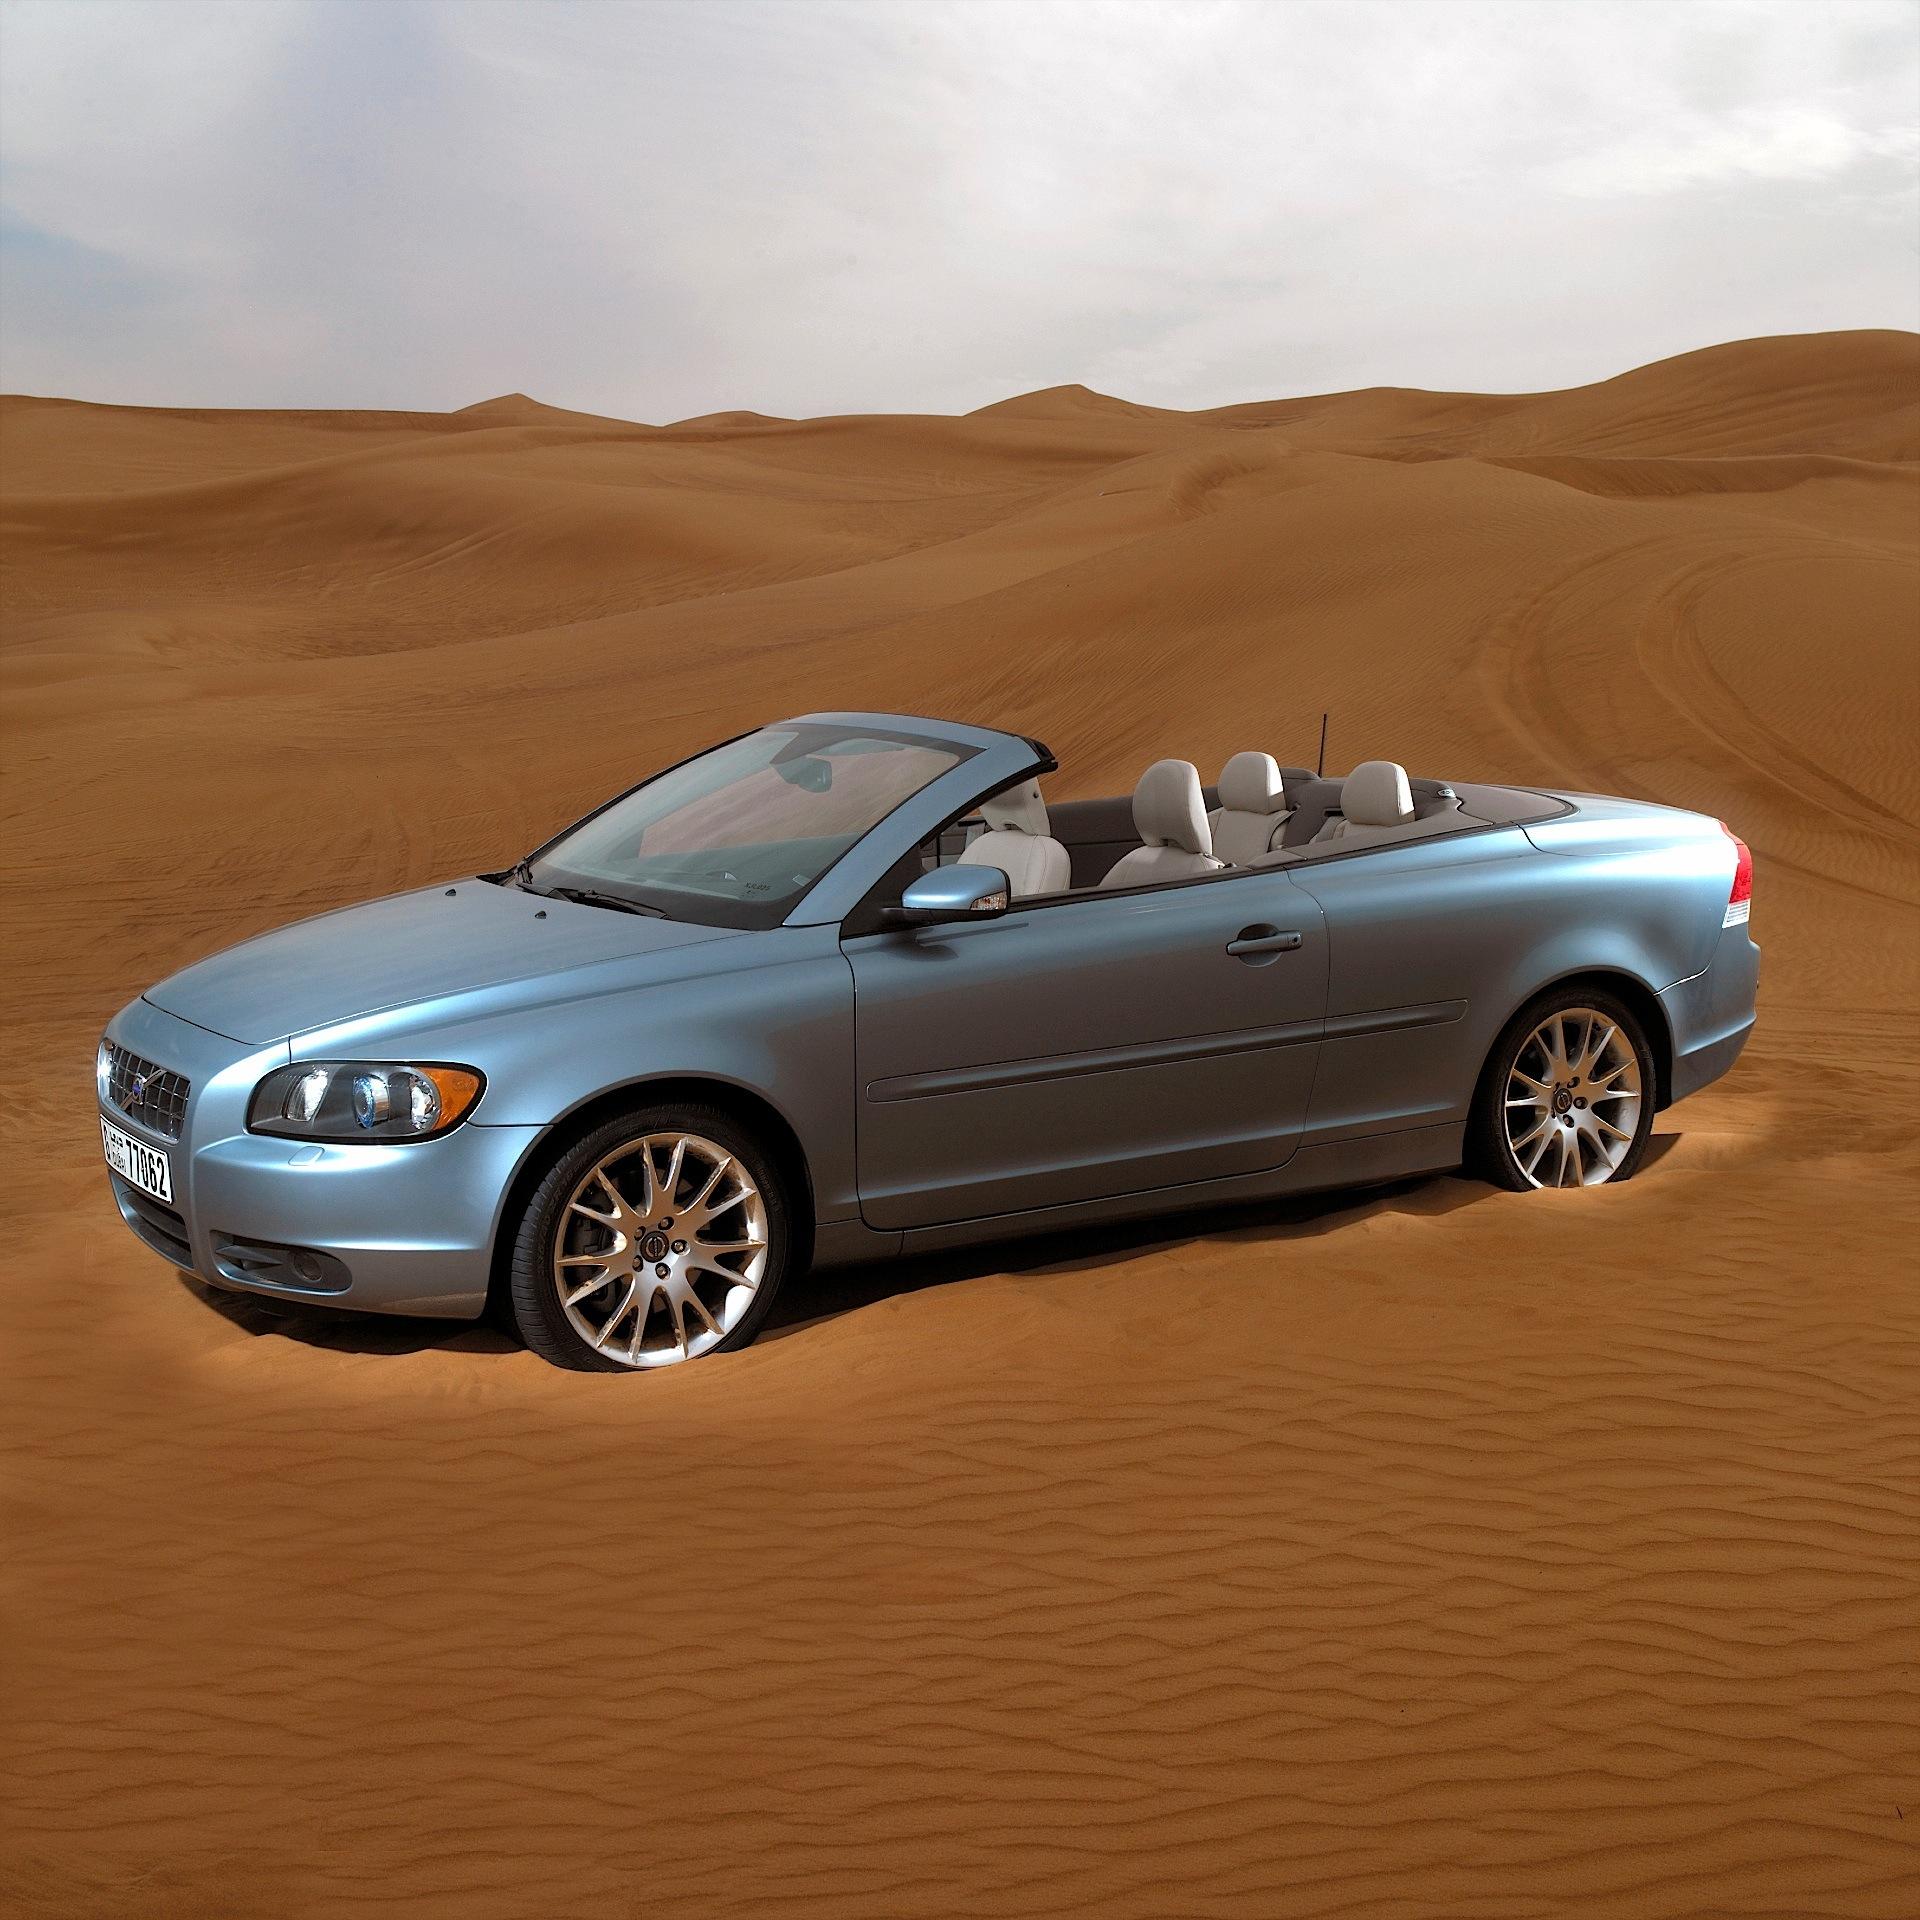 Volvo Pricing: 2005, 2006, 2007, 2008, 2009